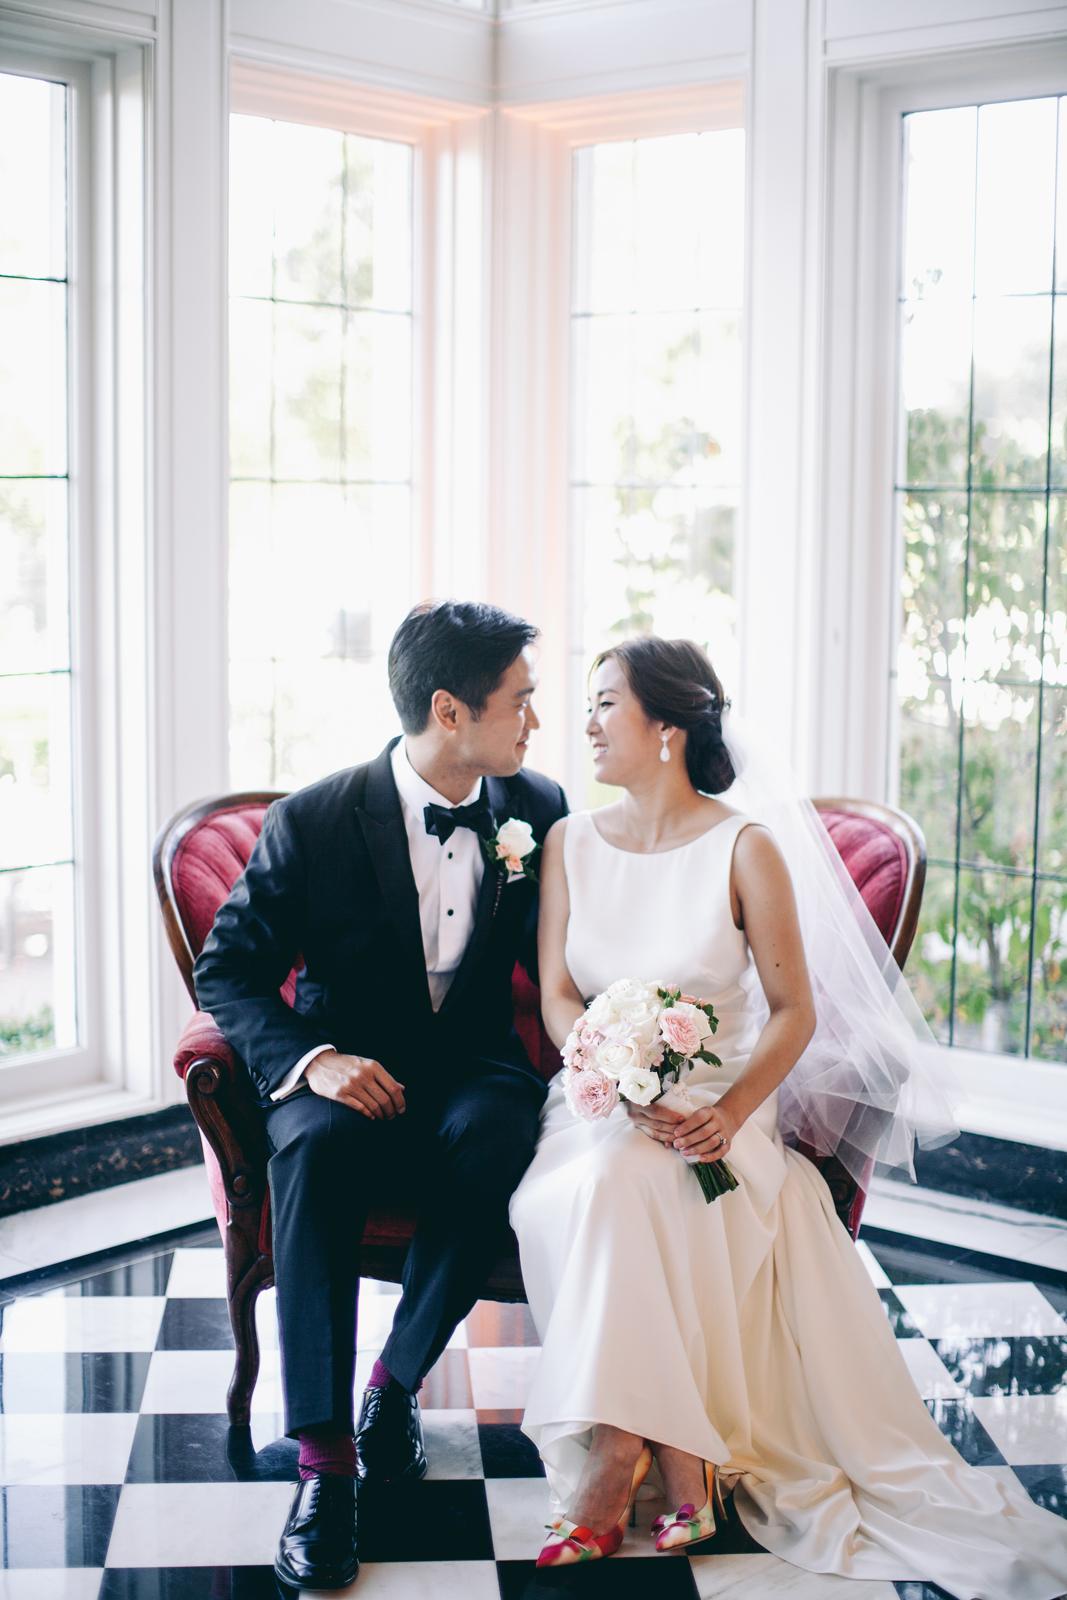 kohl_manison_wedding_photography_sarah_eric_ebony_siovhan_bokeh_photography_026.jpg